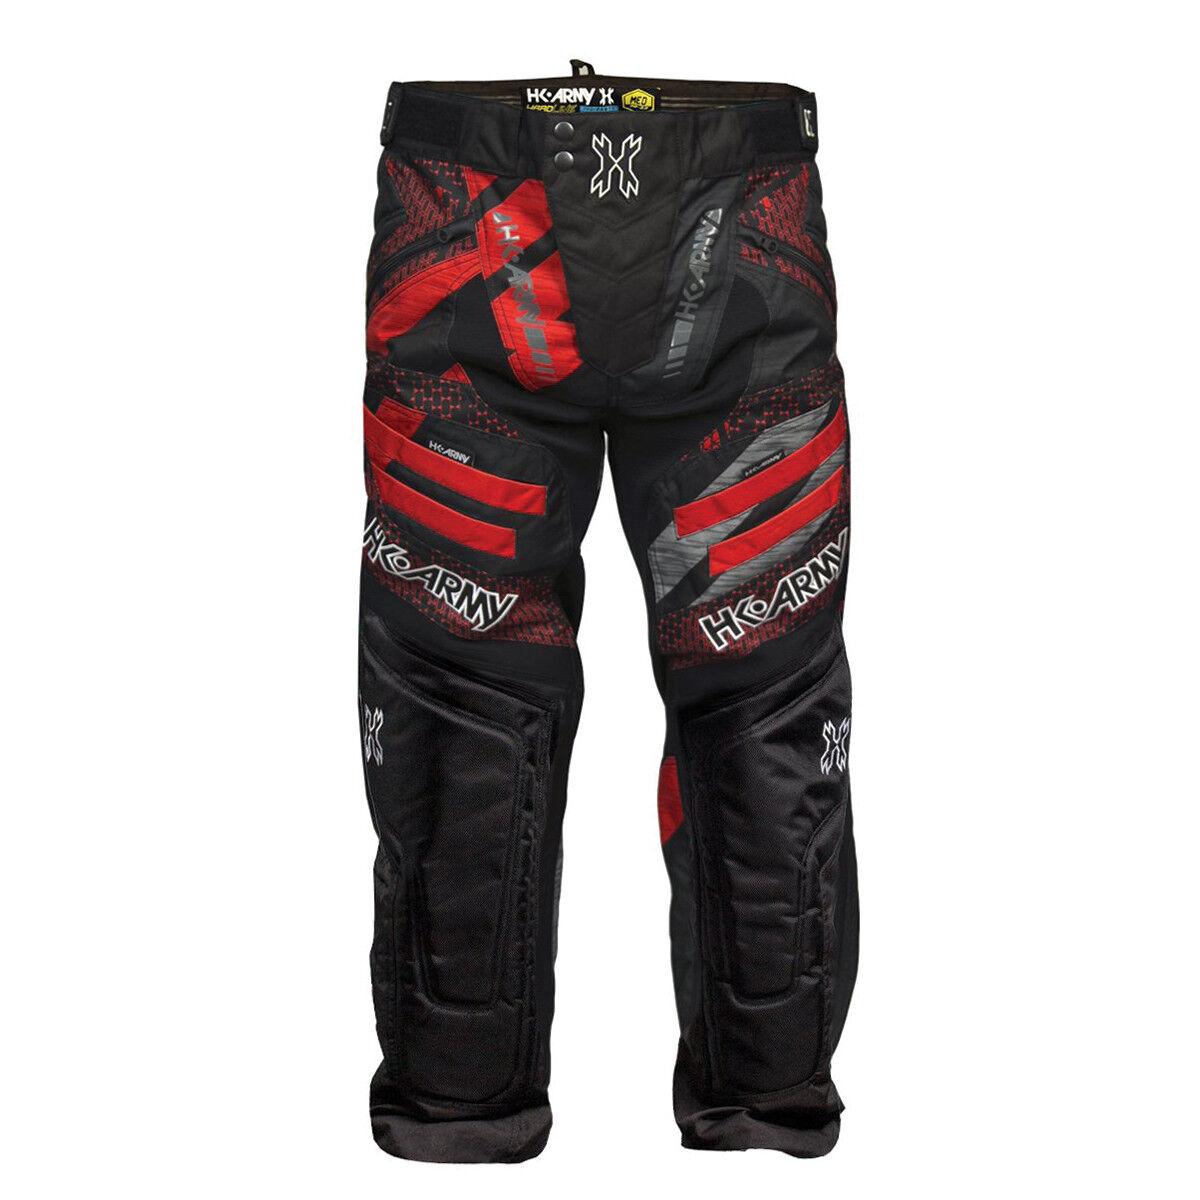 HK Army Hardline Pro Pants - Fire - 2X/3X